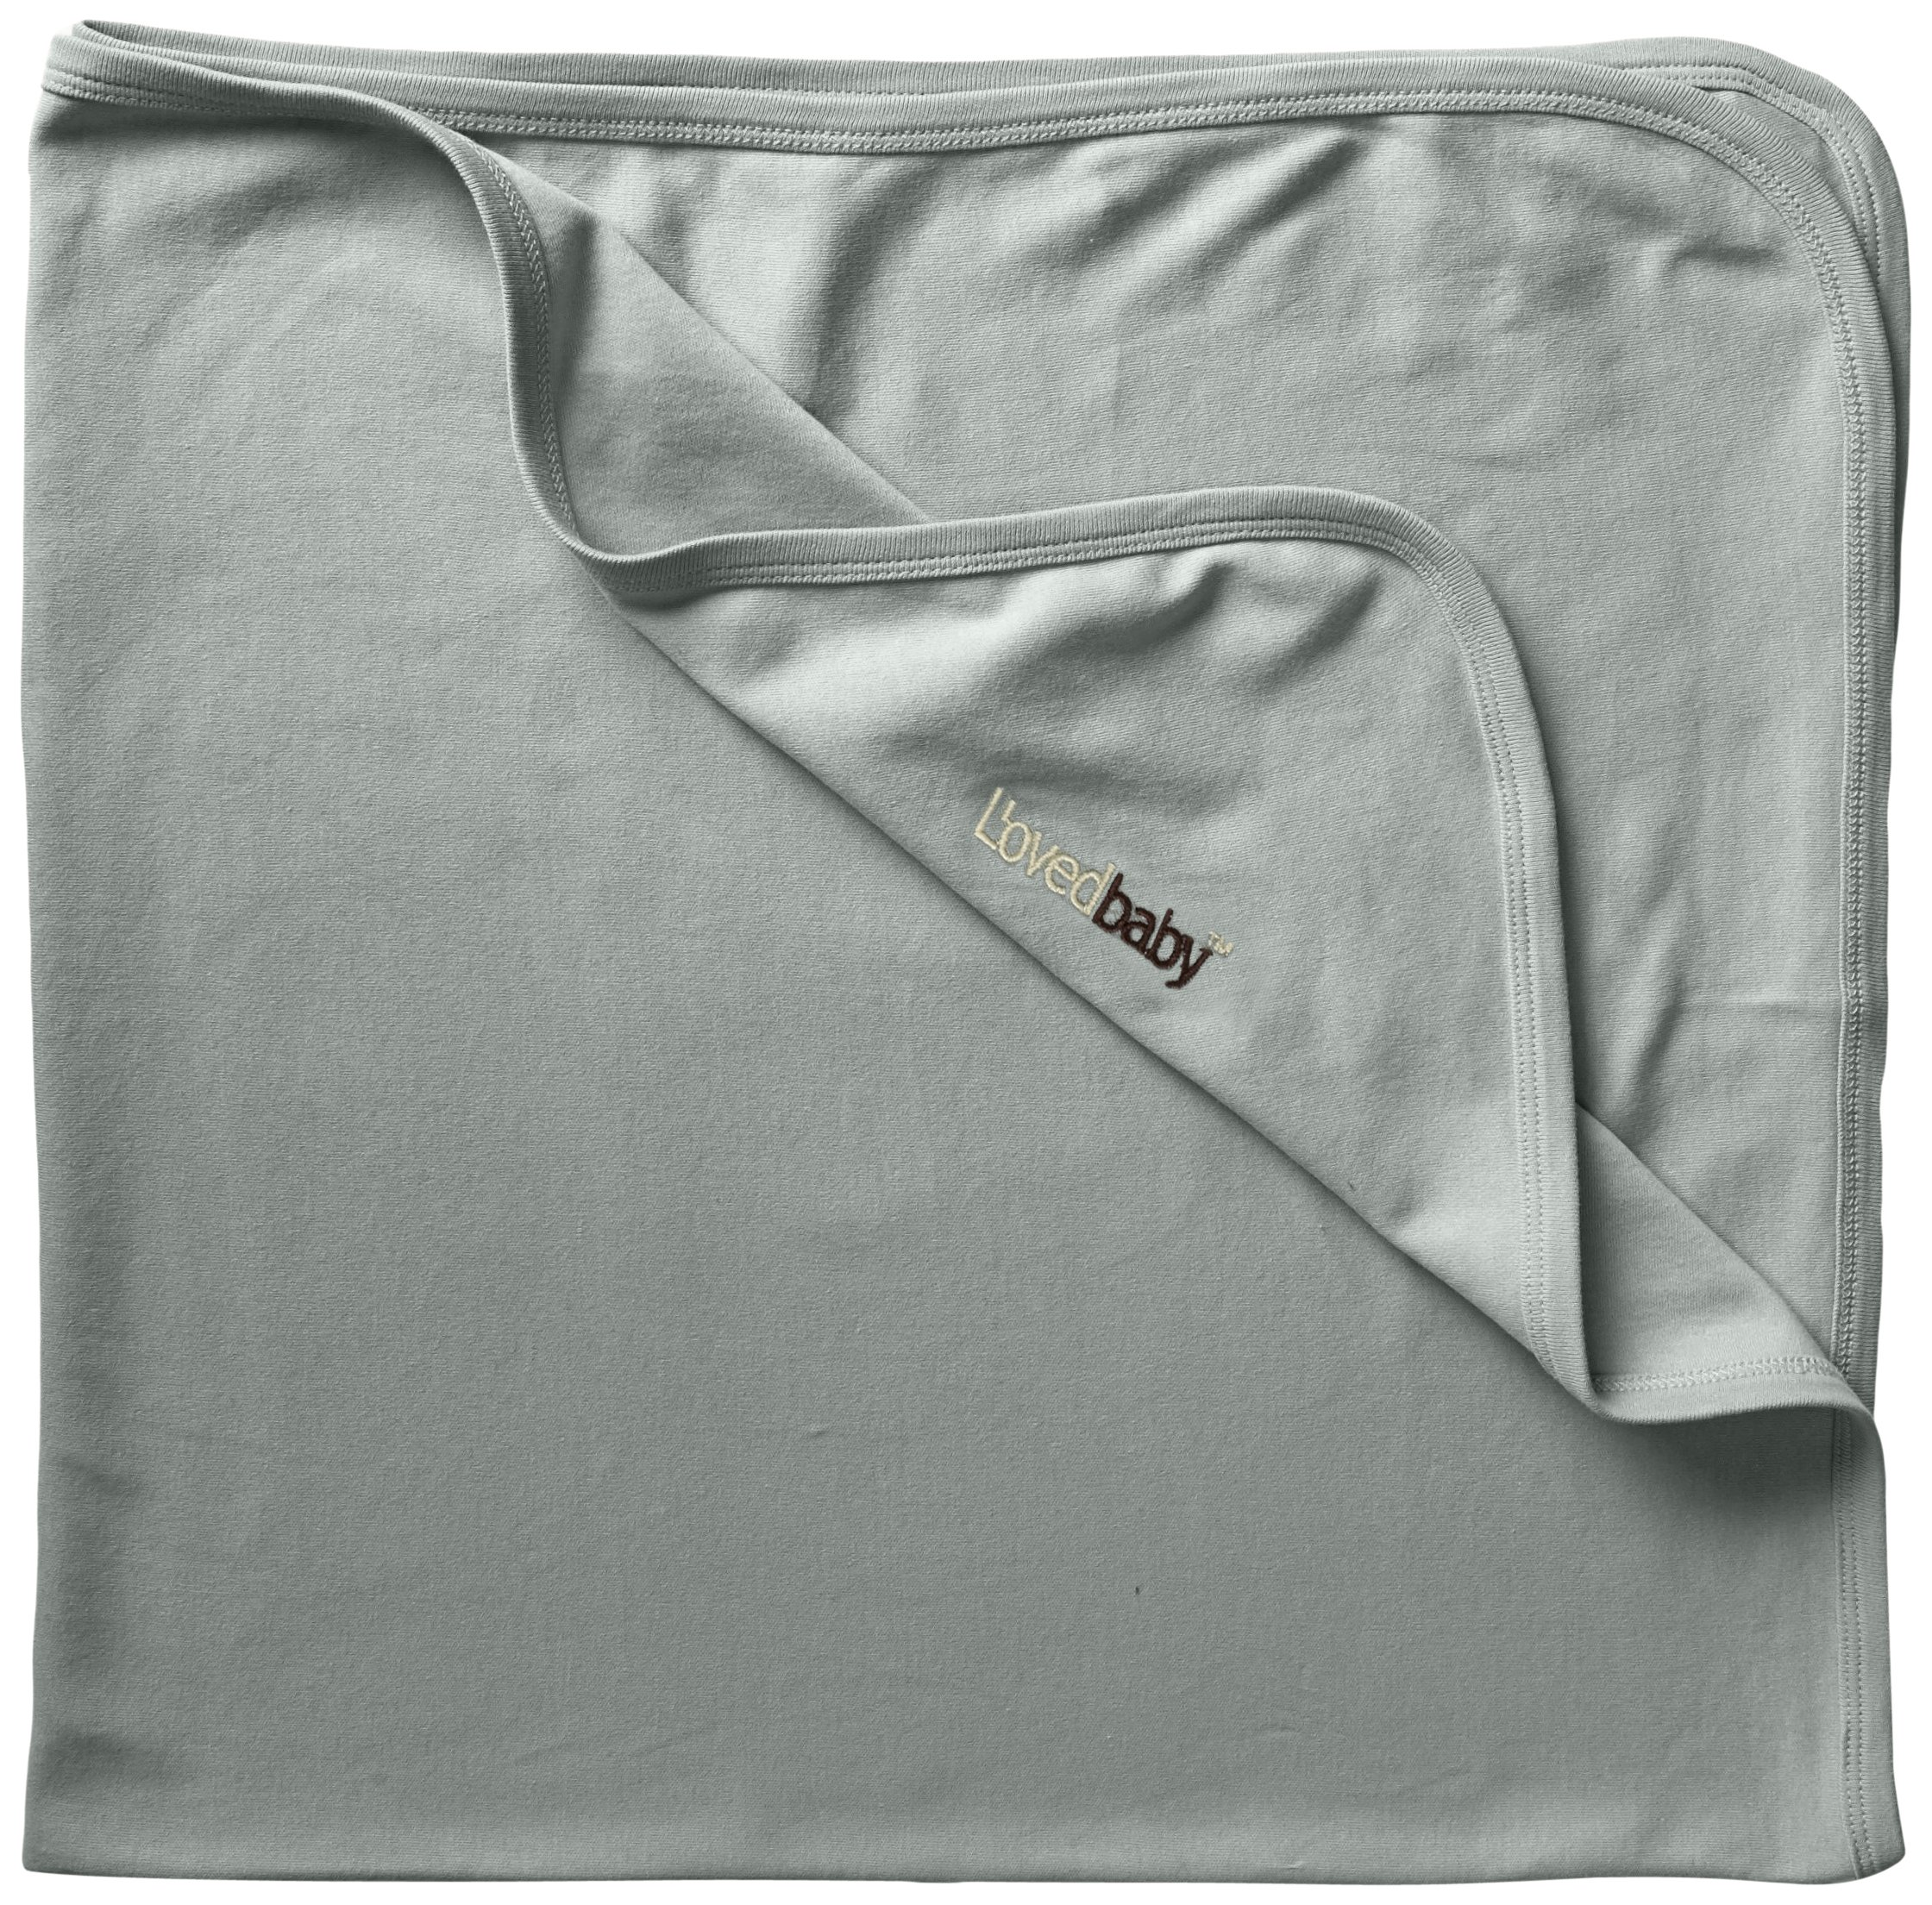 L'ovedbaby Unisex-Baby Newborn Organic Swaddling Blanket, Seafoam, One Size